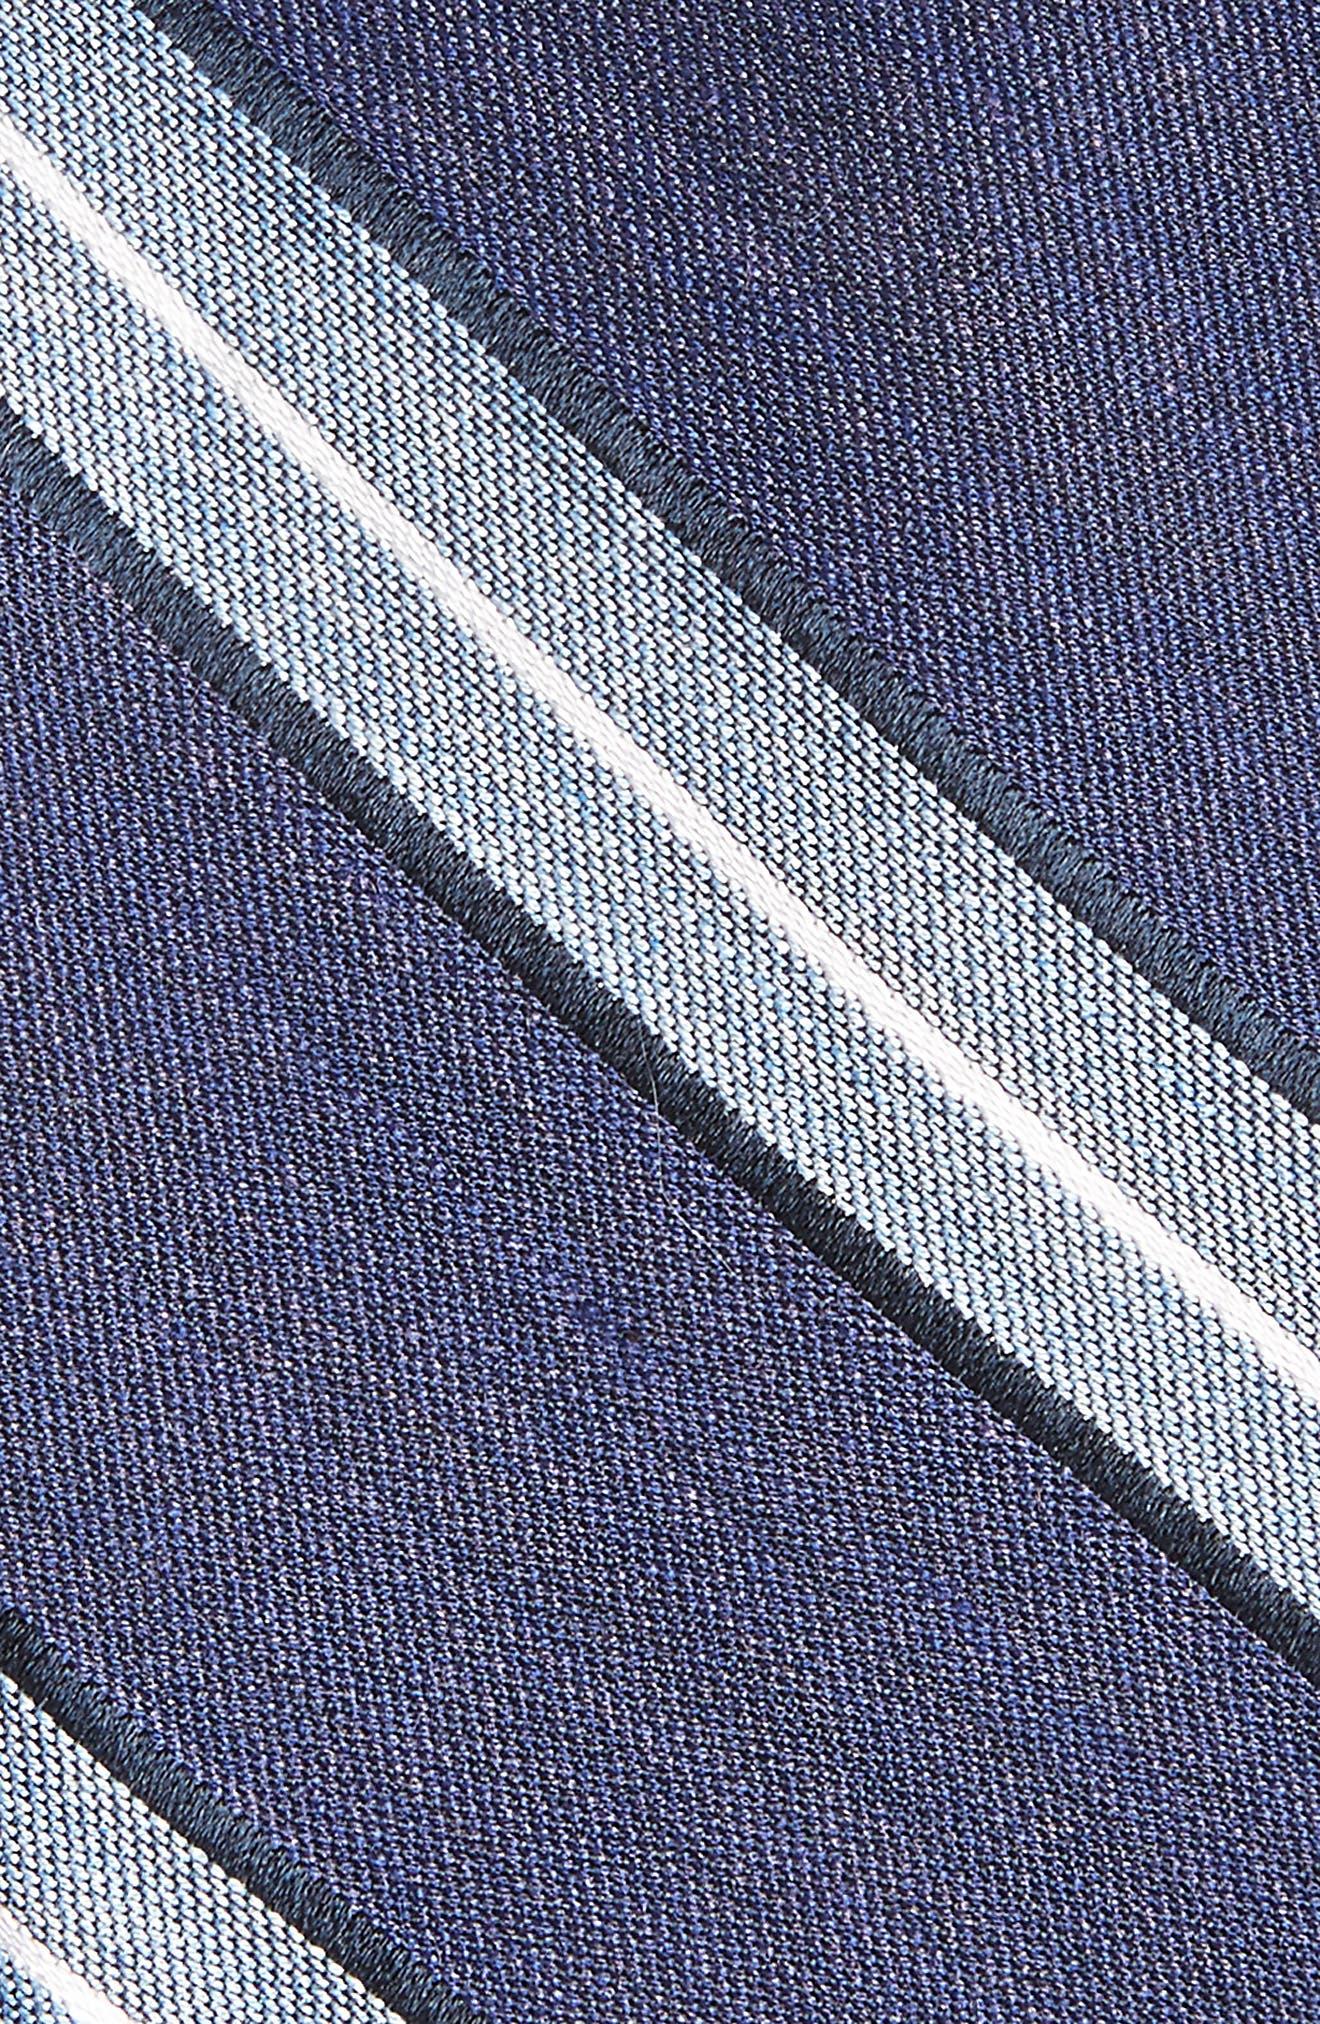 Alternate Image 2  - Nordstrom Men's Shop Peralba Stripe Silk Blend Tie